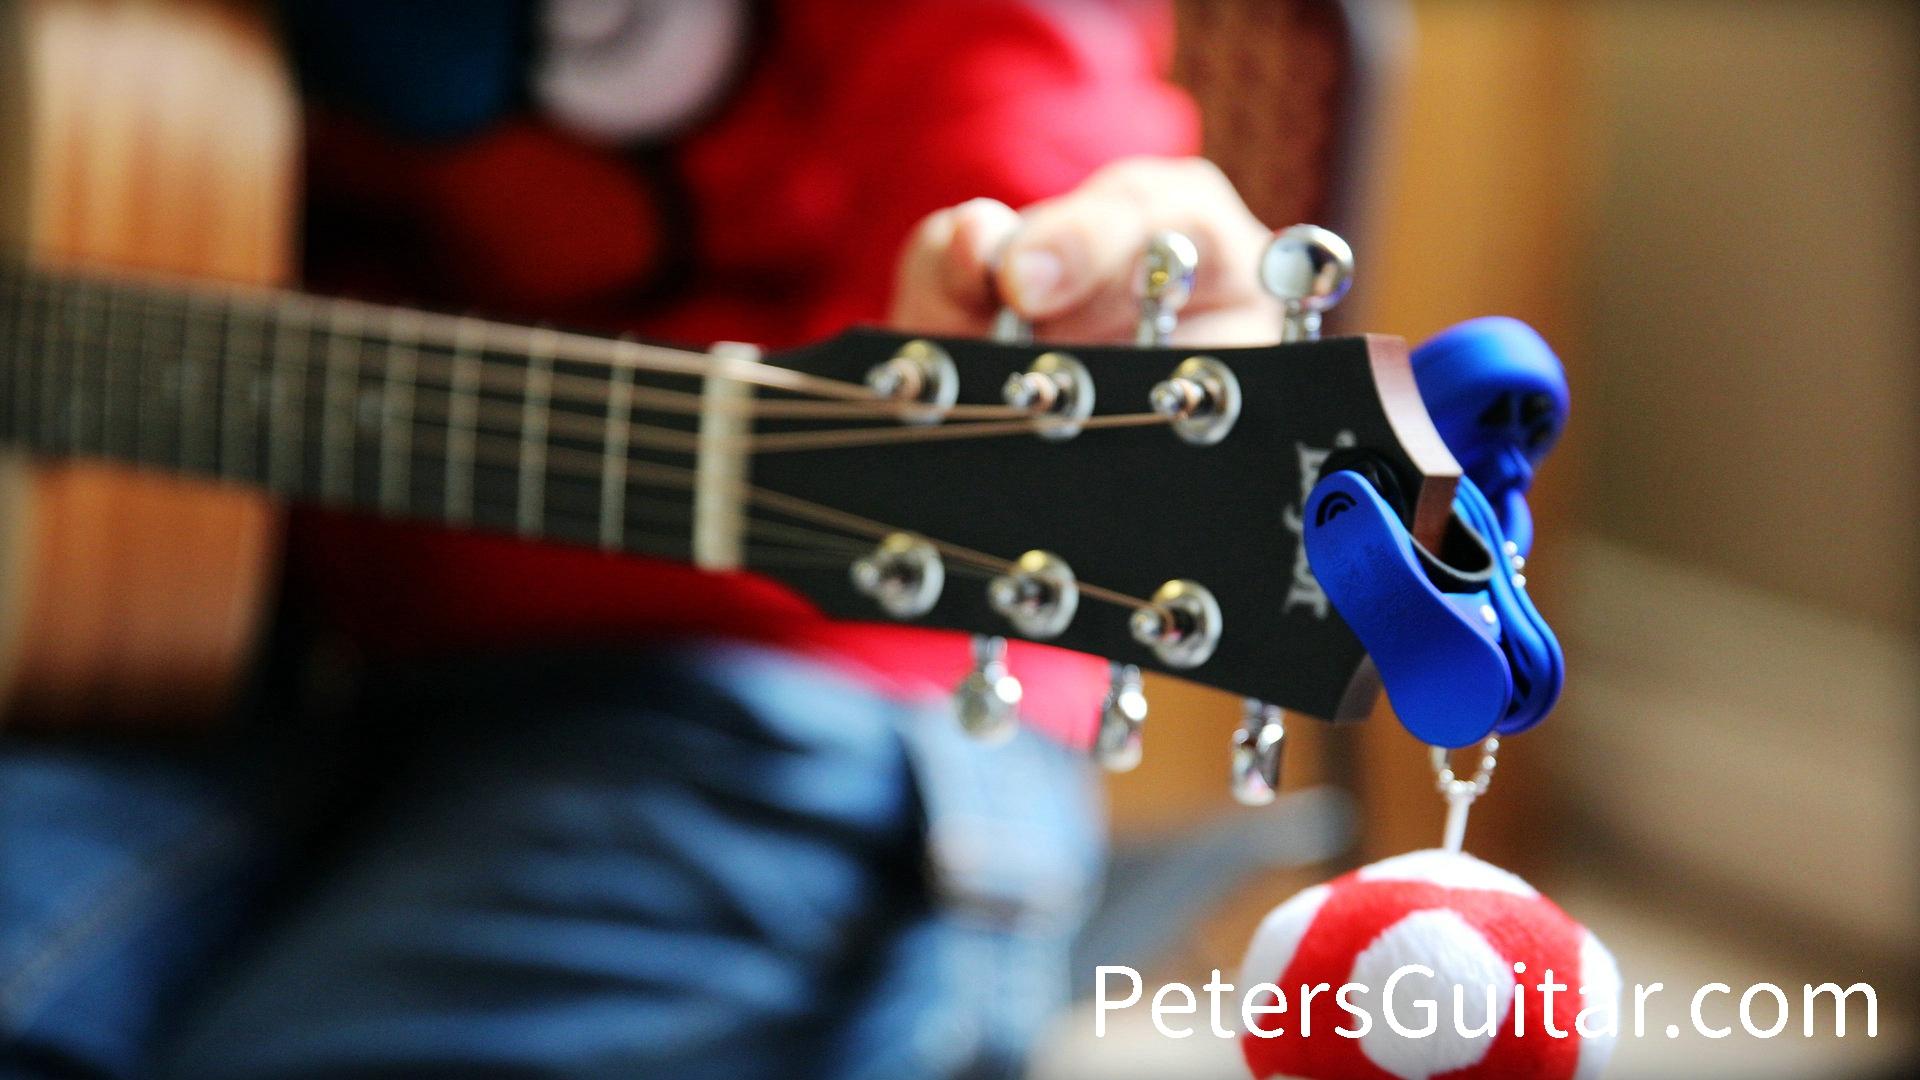 PetersGuitar_com 功夫吉他 温哥华吉他老师43.jpg